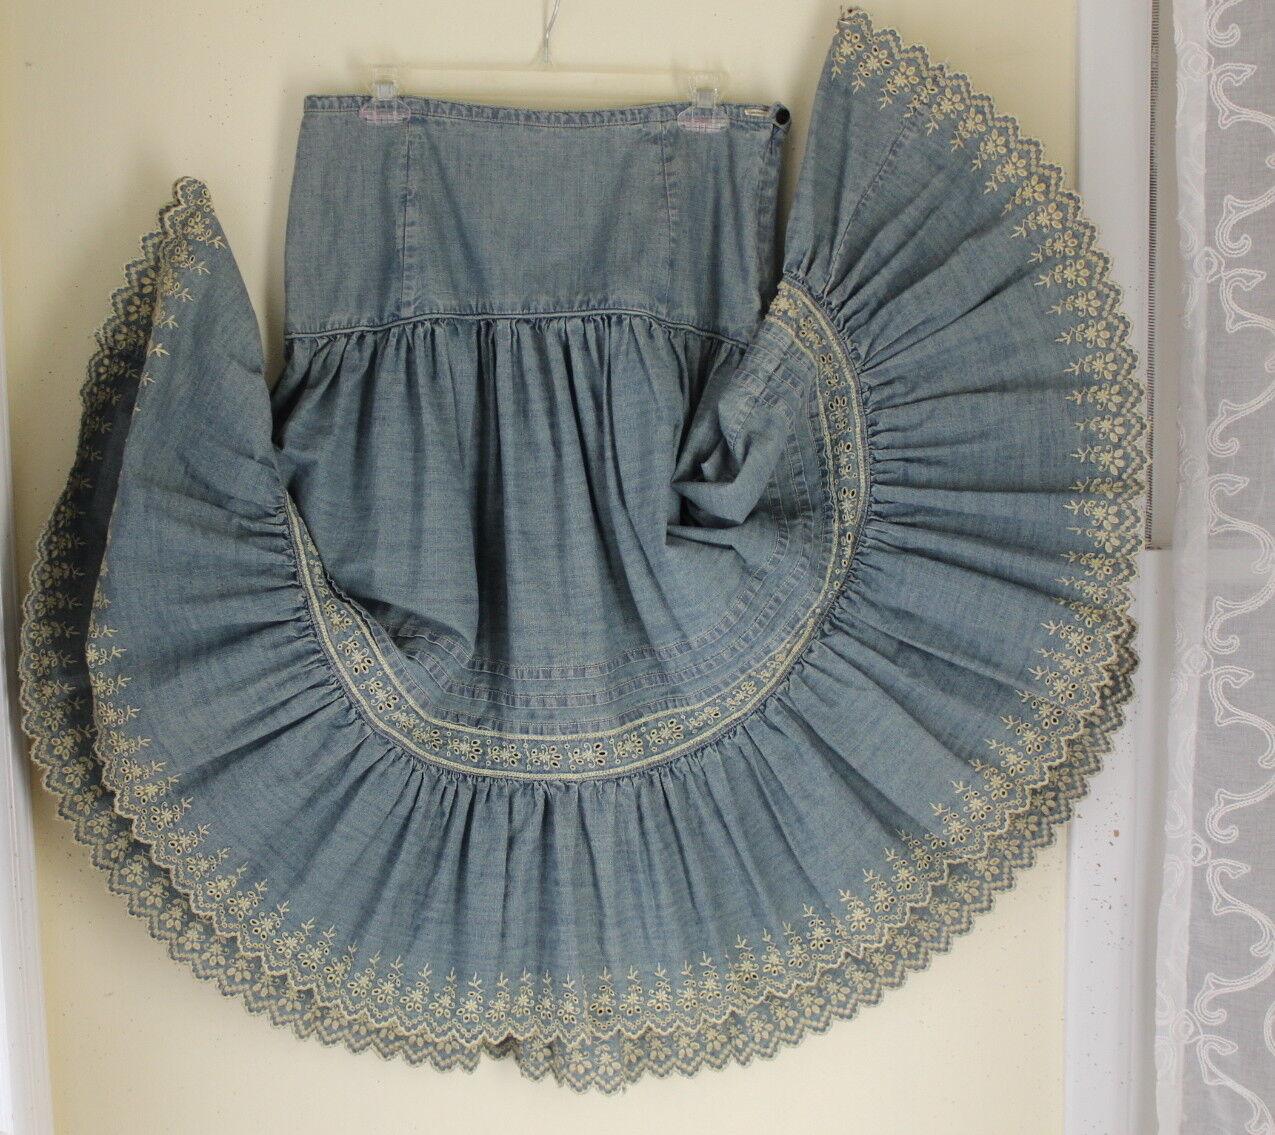 Polo Ralph Lauren -Sz 8 Elegant Tiered Gypsy A-Line Full Western Eyelet Skirt